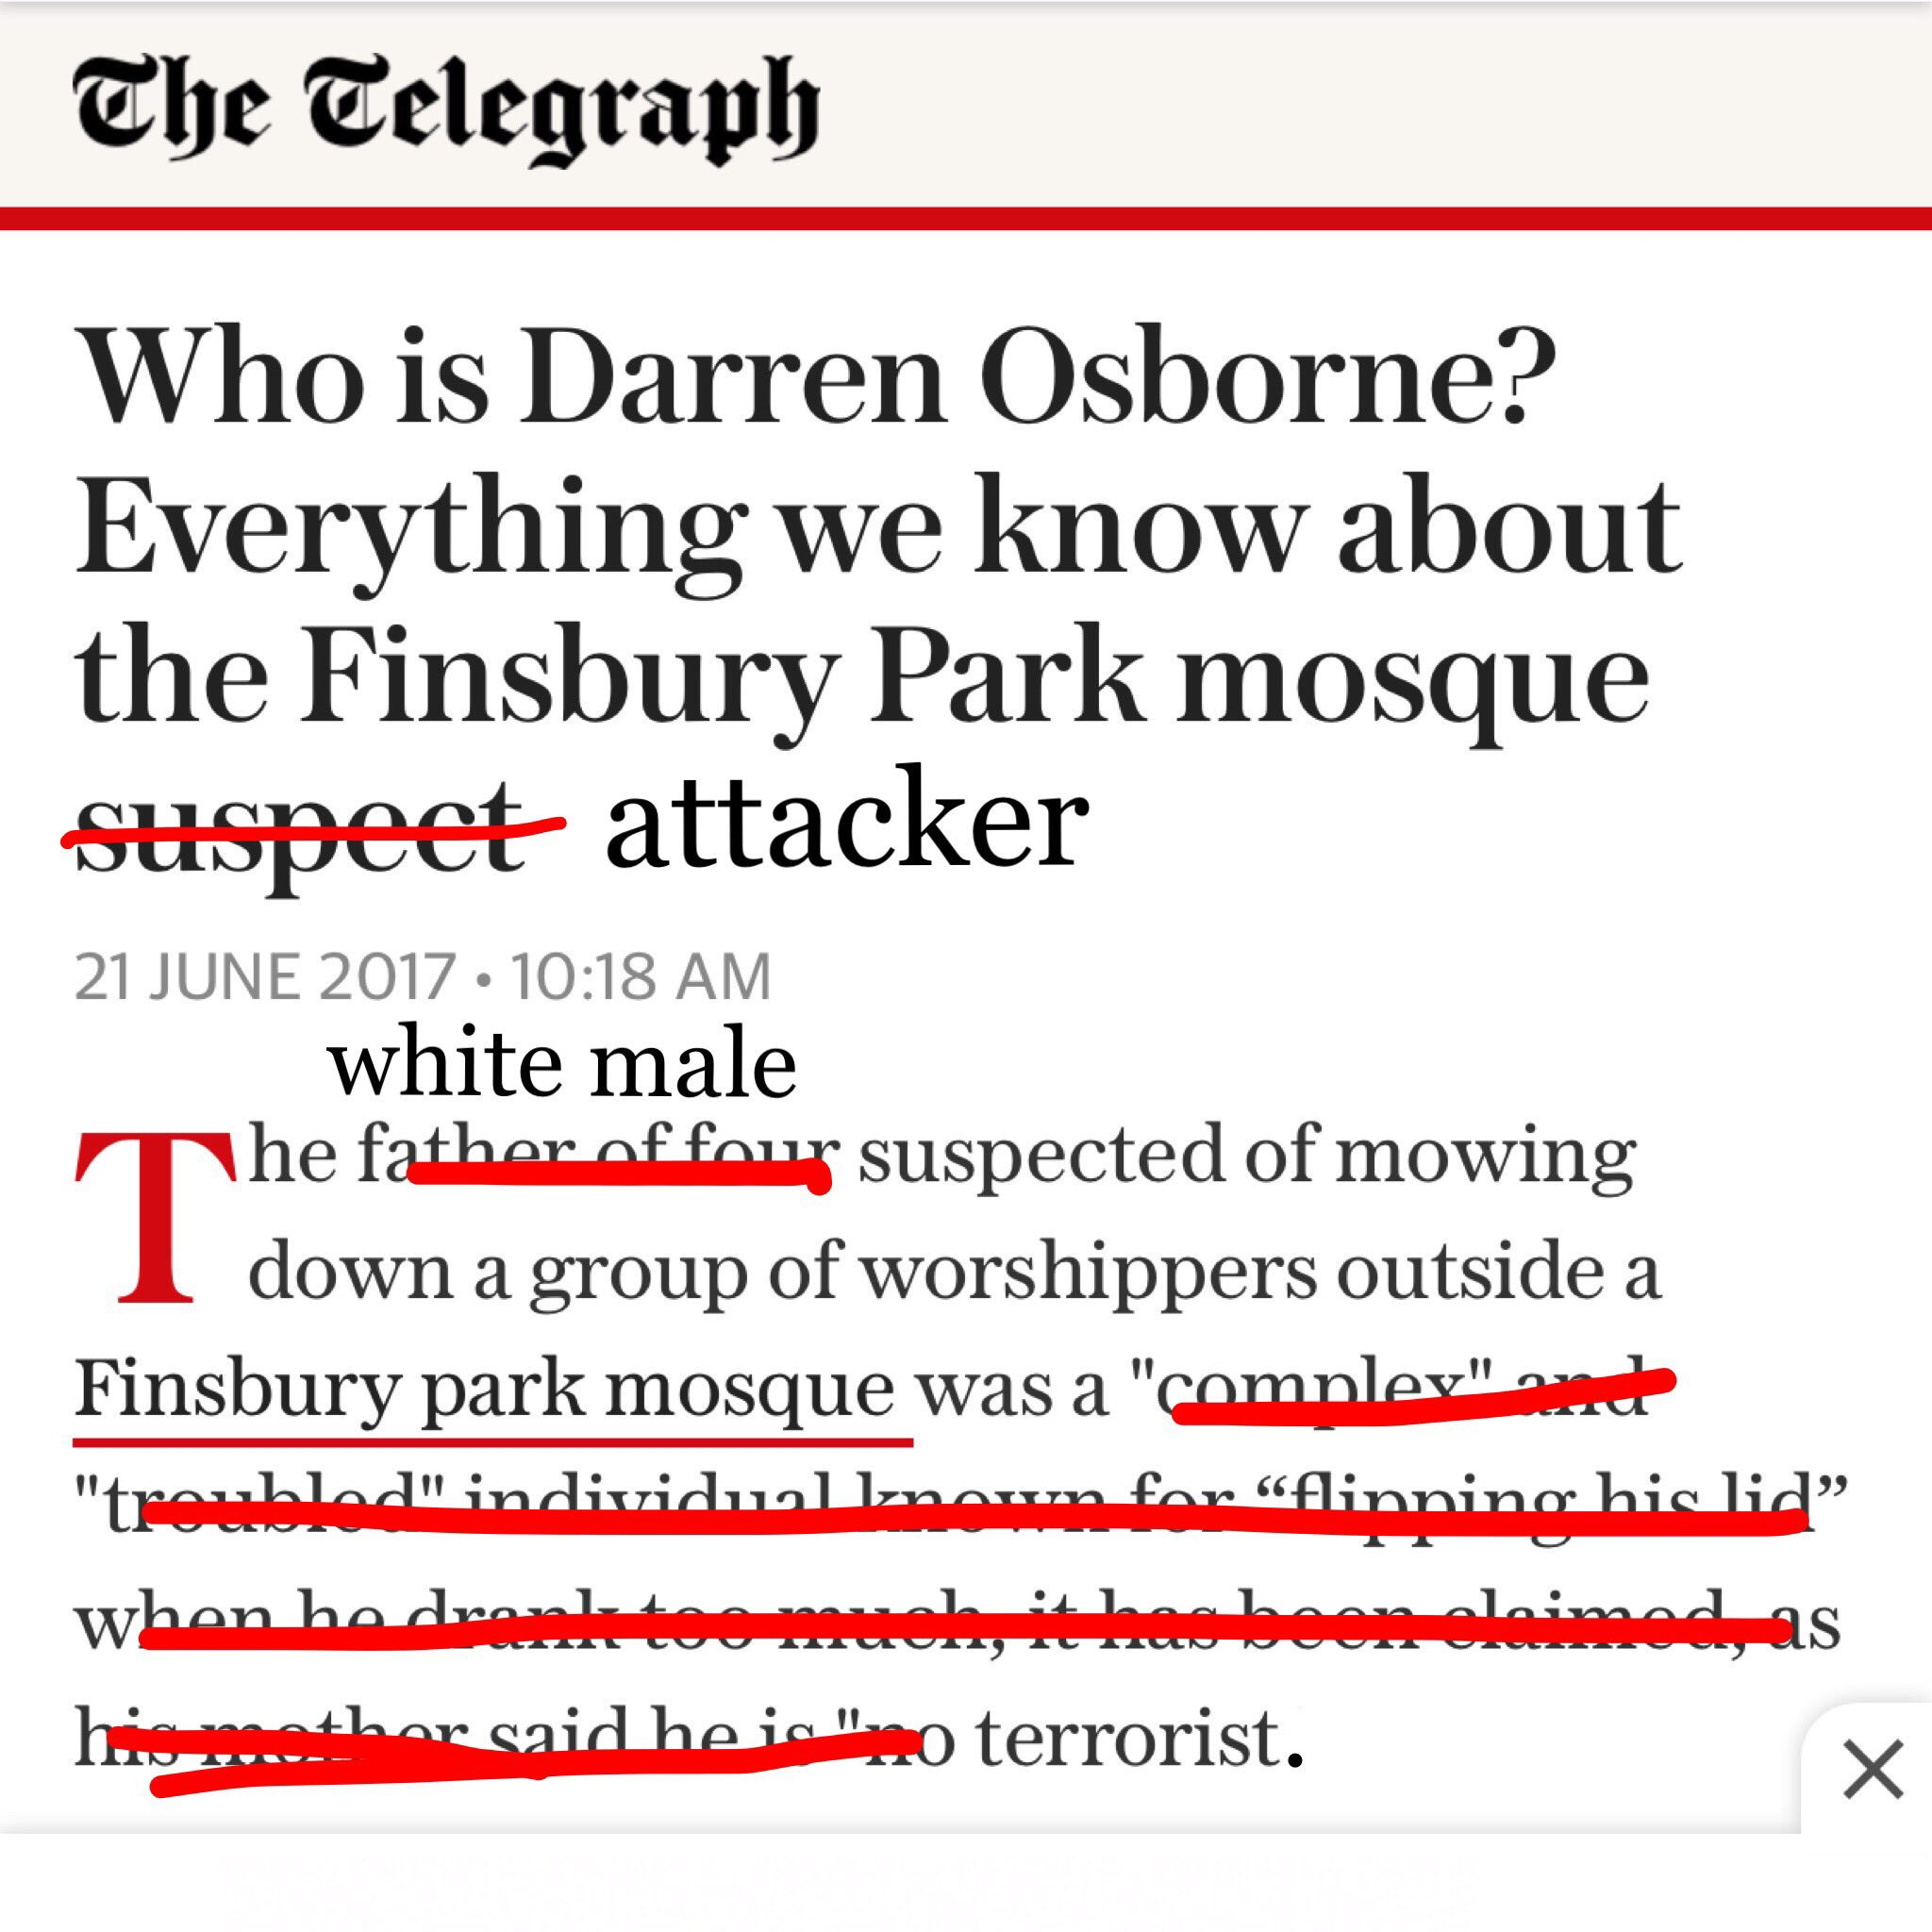 RT @MuslimIQ: Fixed that for you.  #FinsburyMosqueAttack https://t.co/CFgWRGfI0p